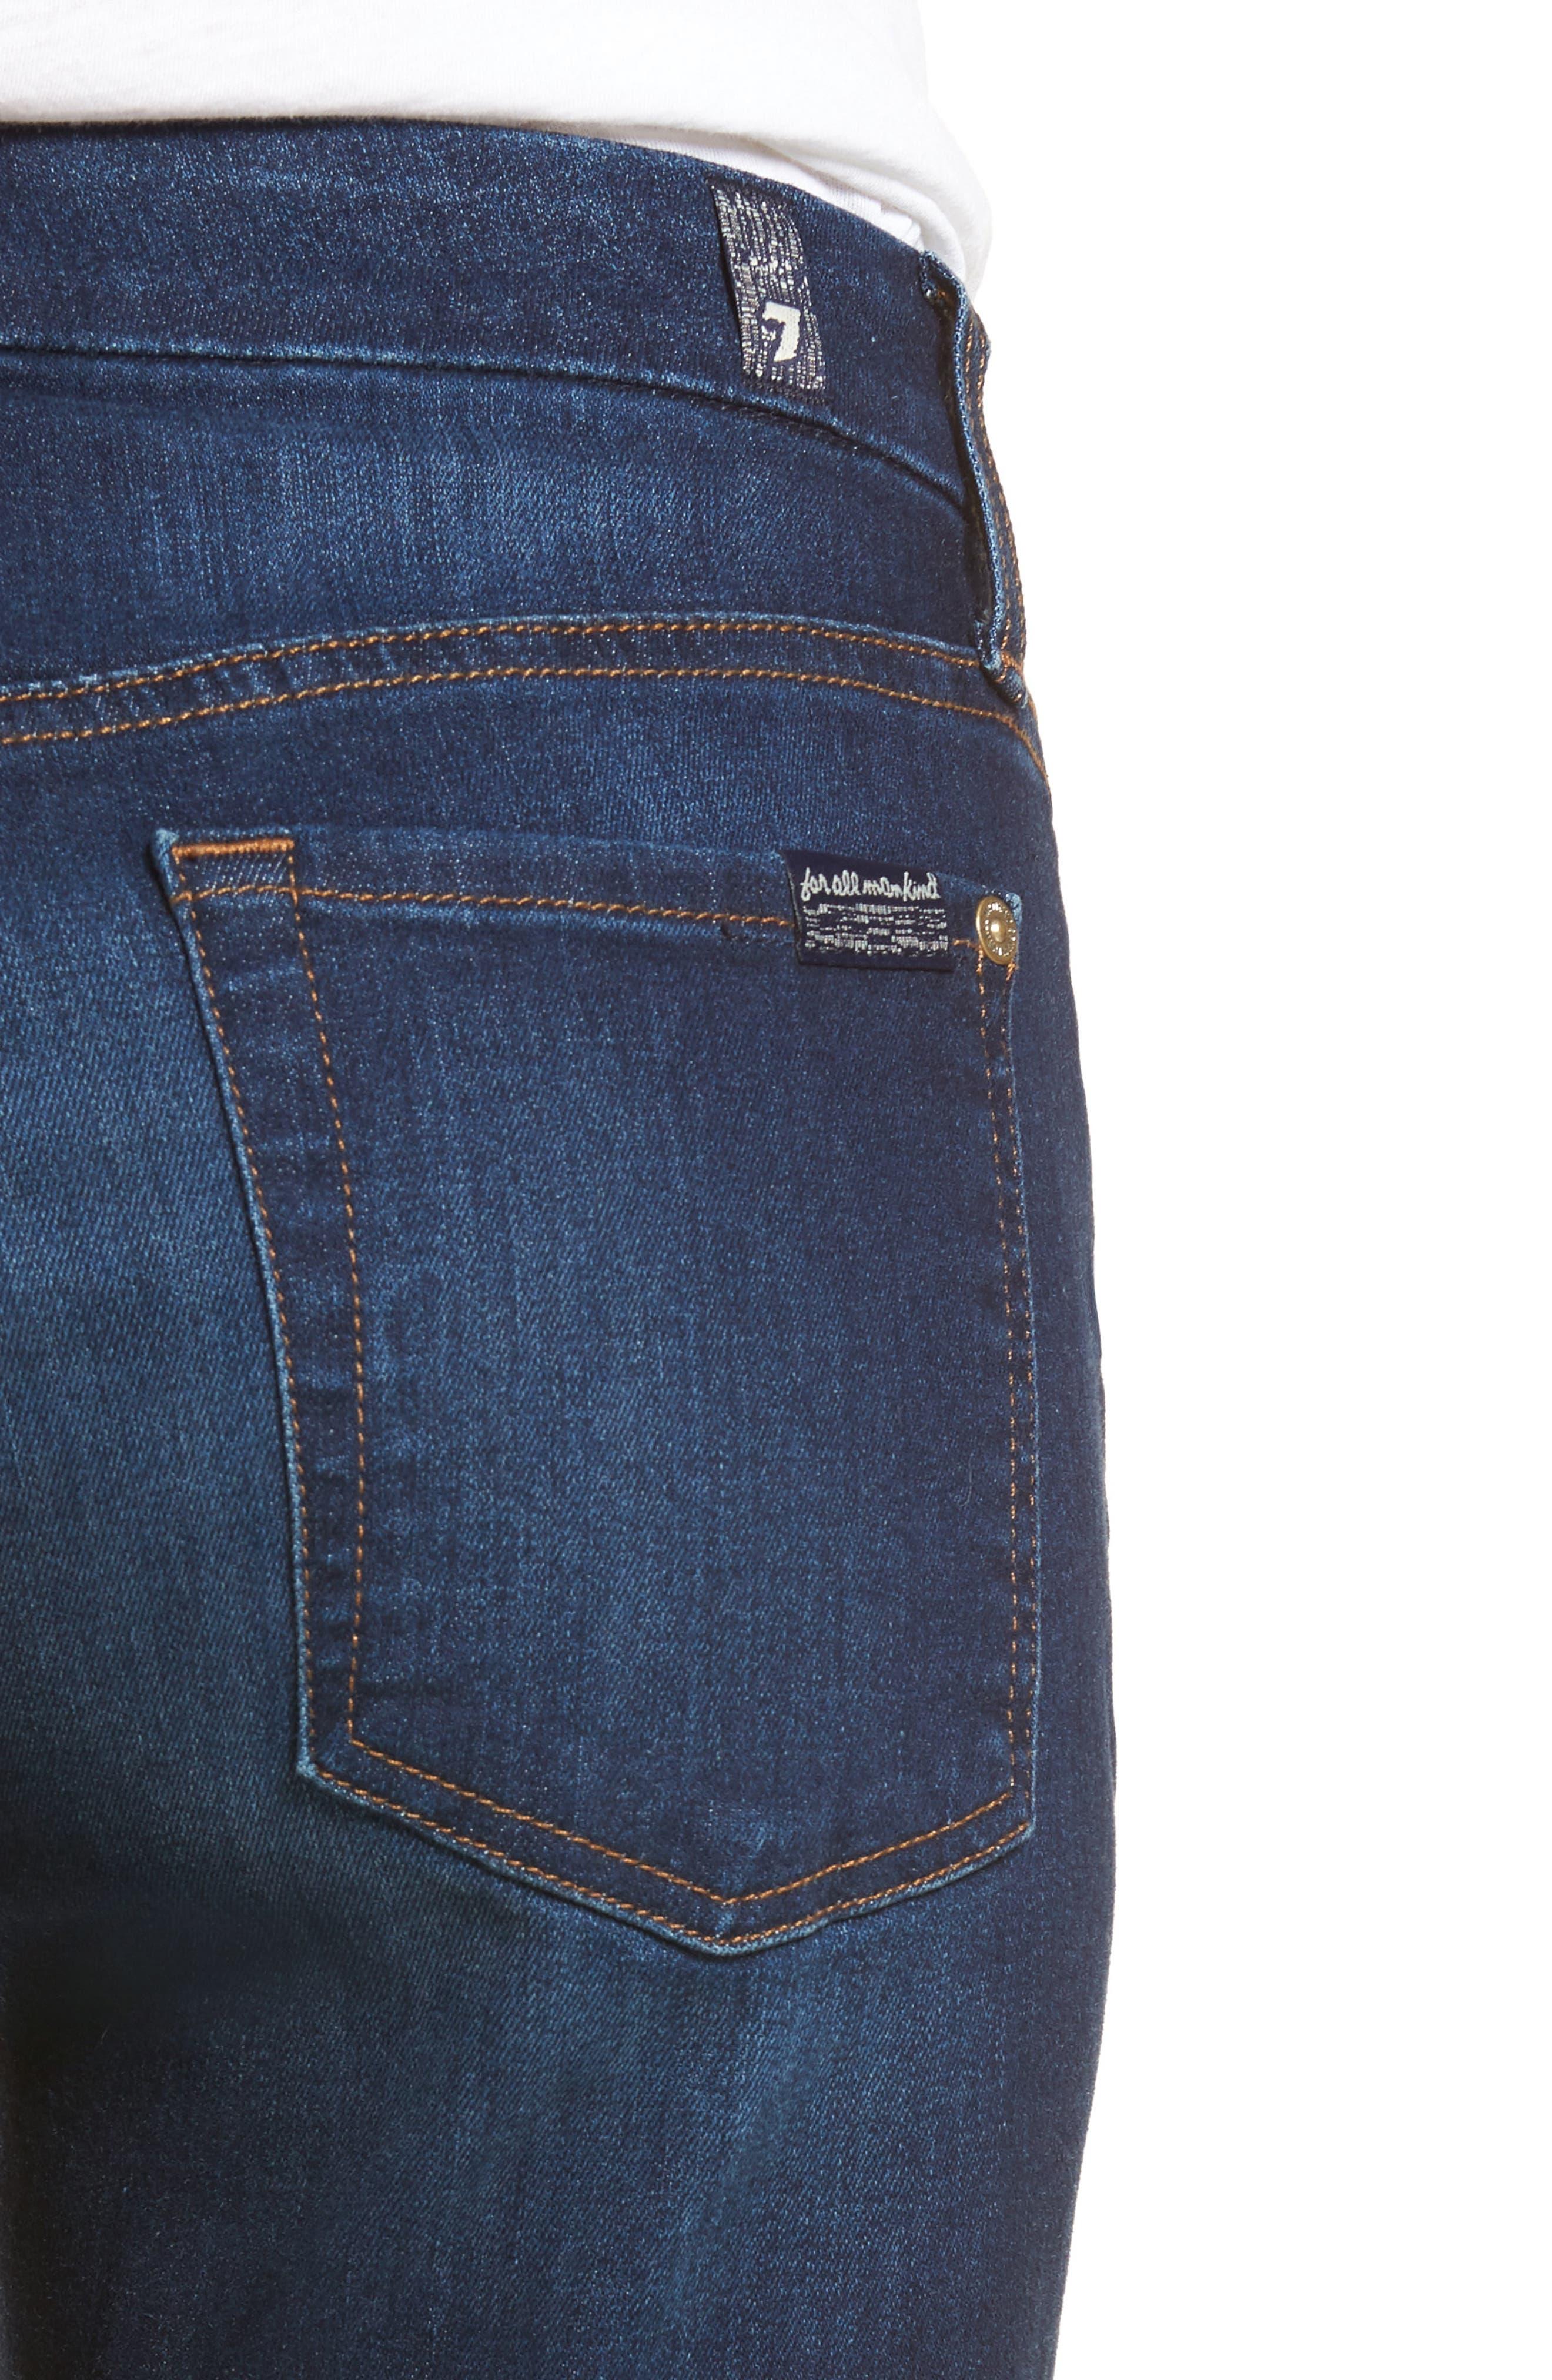 High Waist Skinny Jeans,                             Alternate thumbnail 4, color,                             Moreno